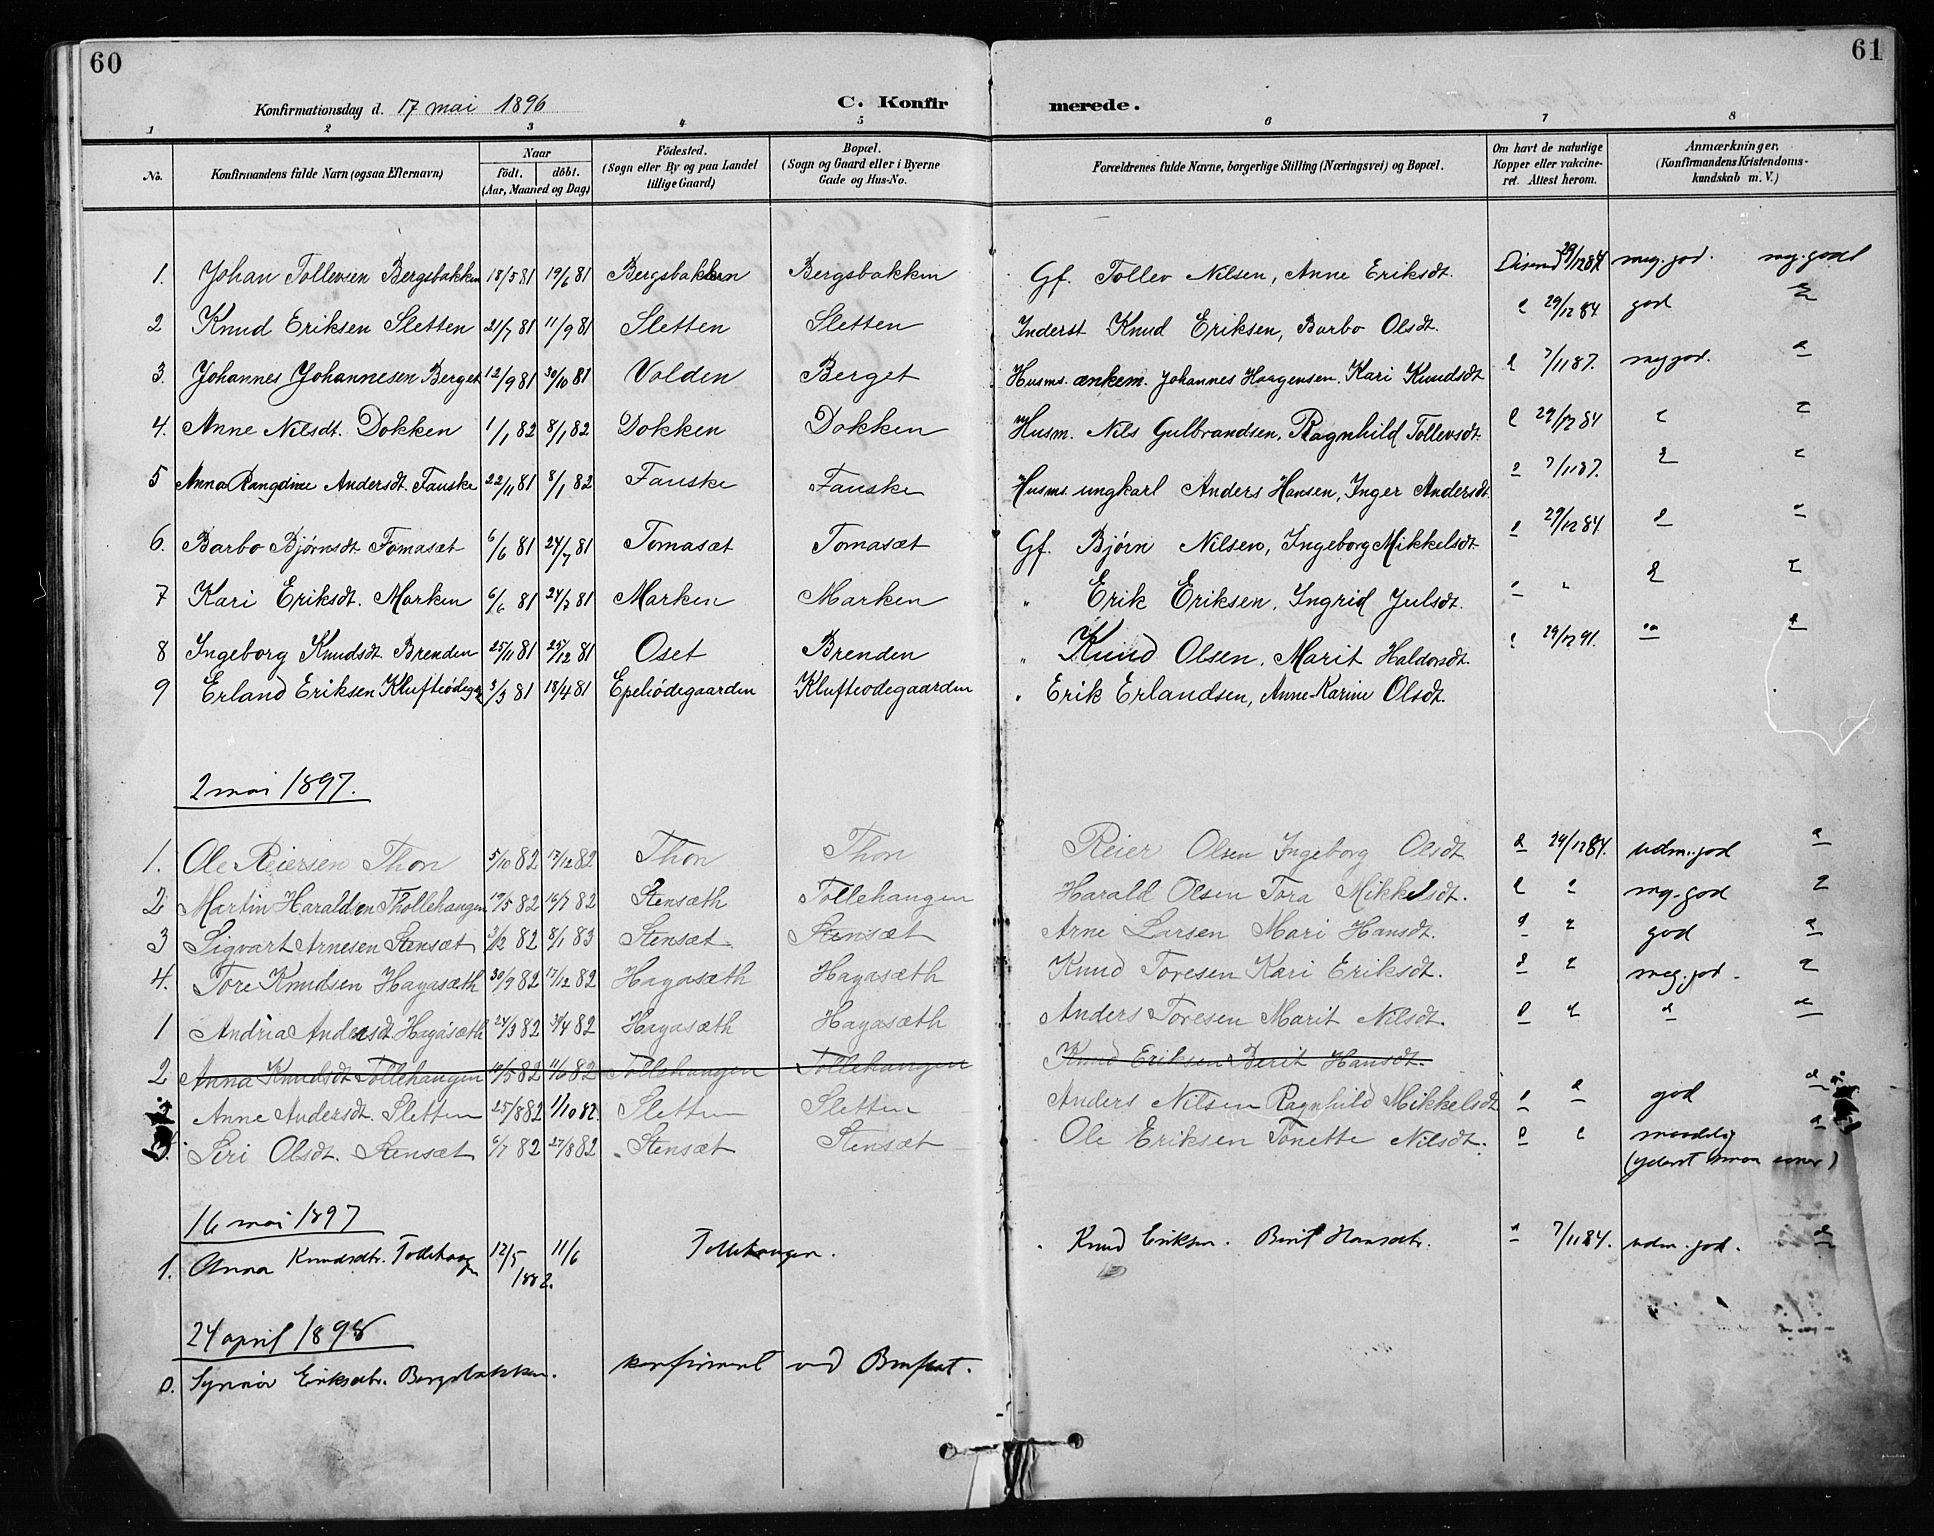 SAH, Etnedal prestekontor, H/Ha/Hab/Habb/L0001: Klokkerbok nr. II 1, 1894-1911, s. 60-61